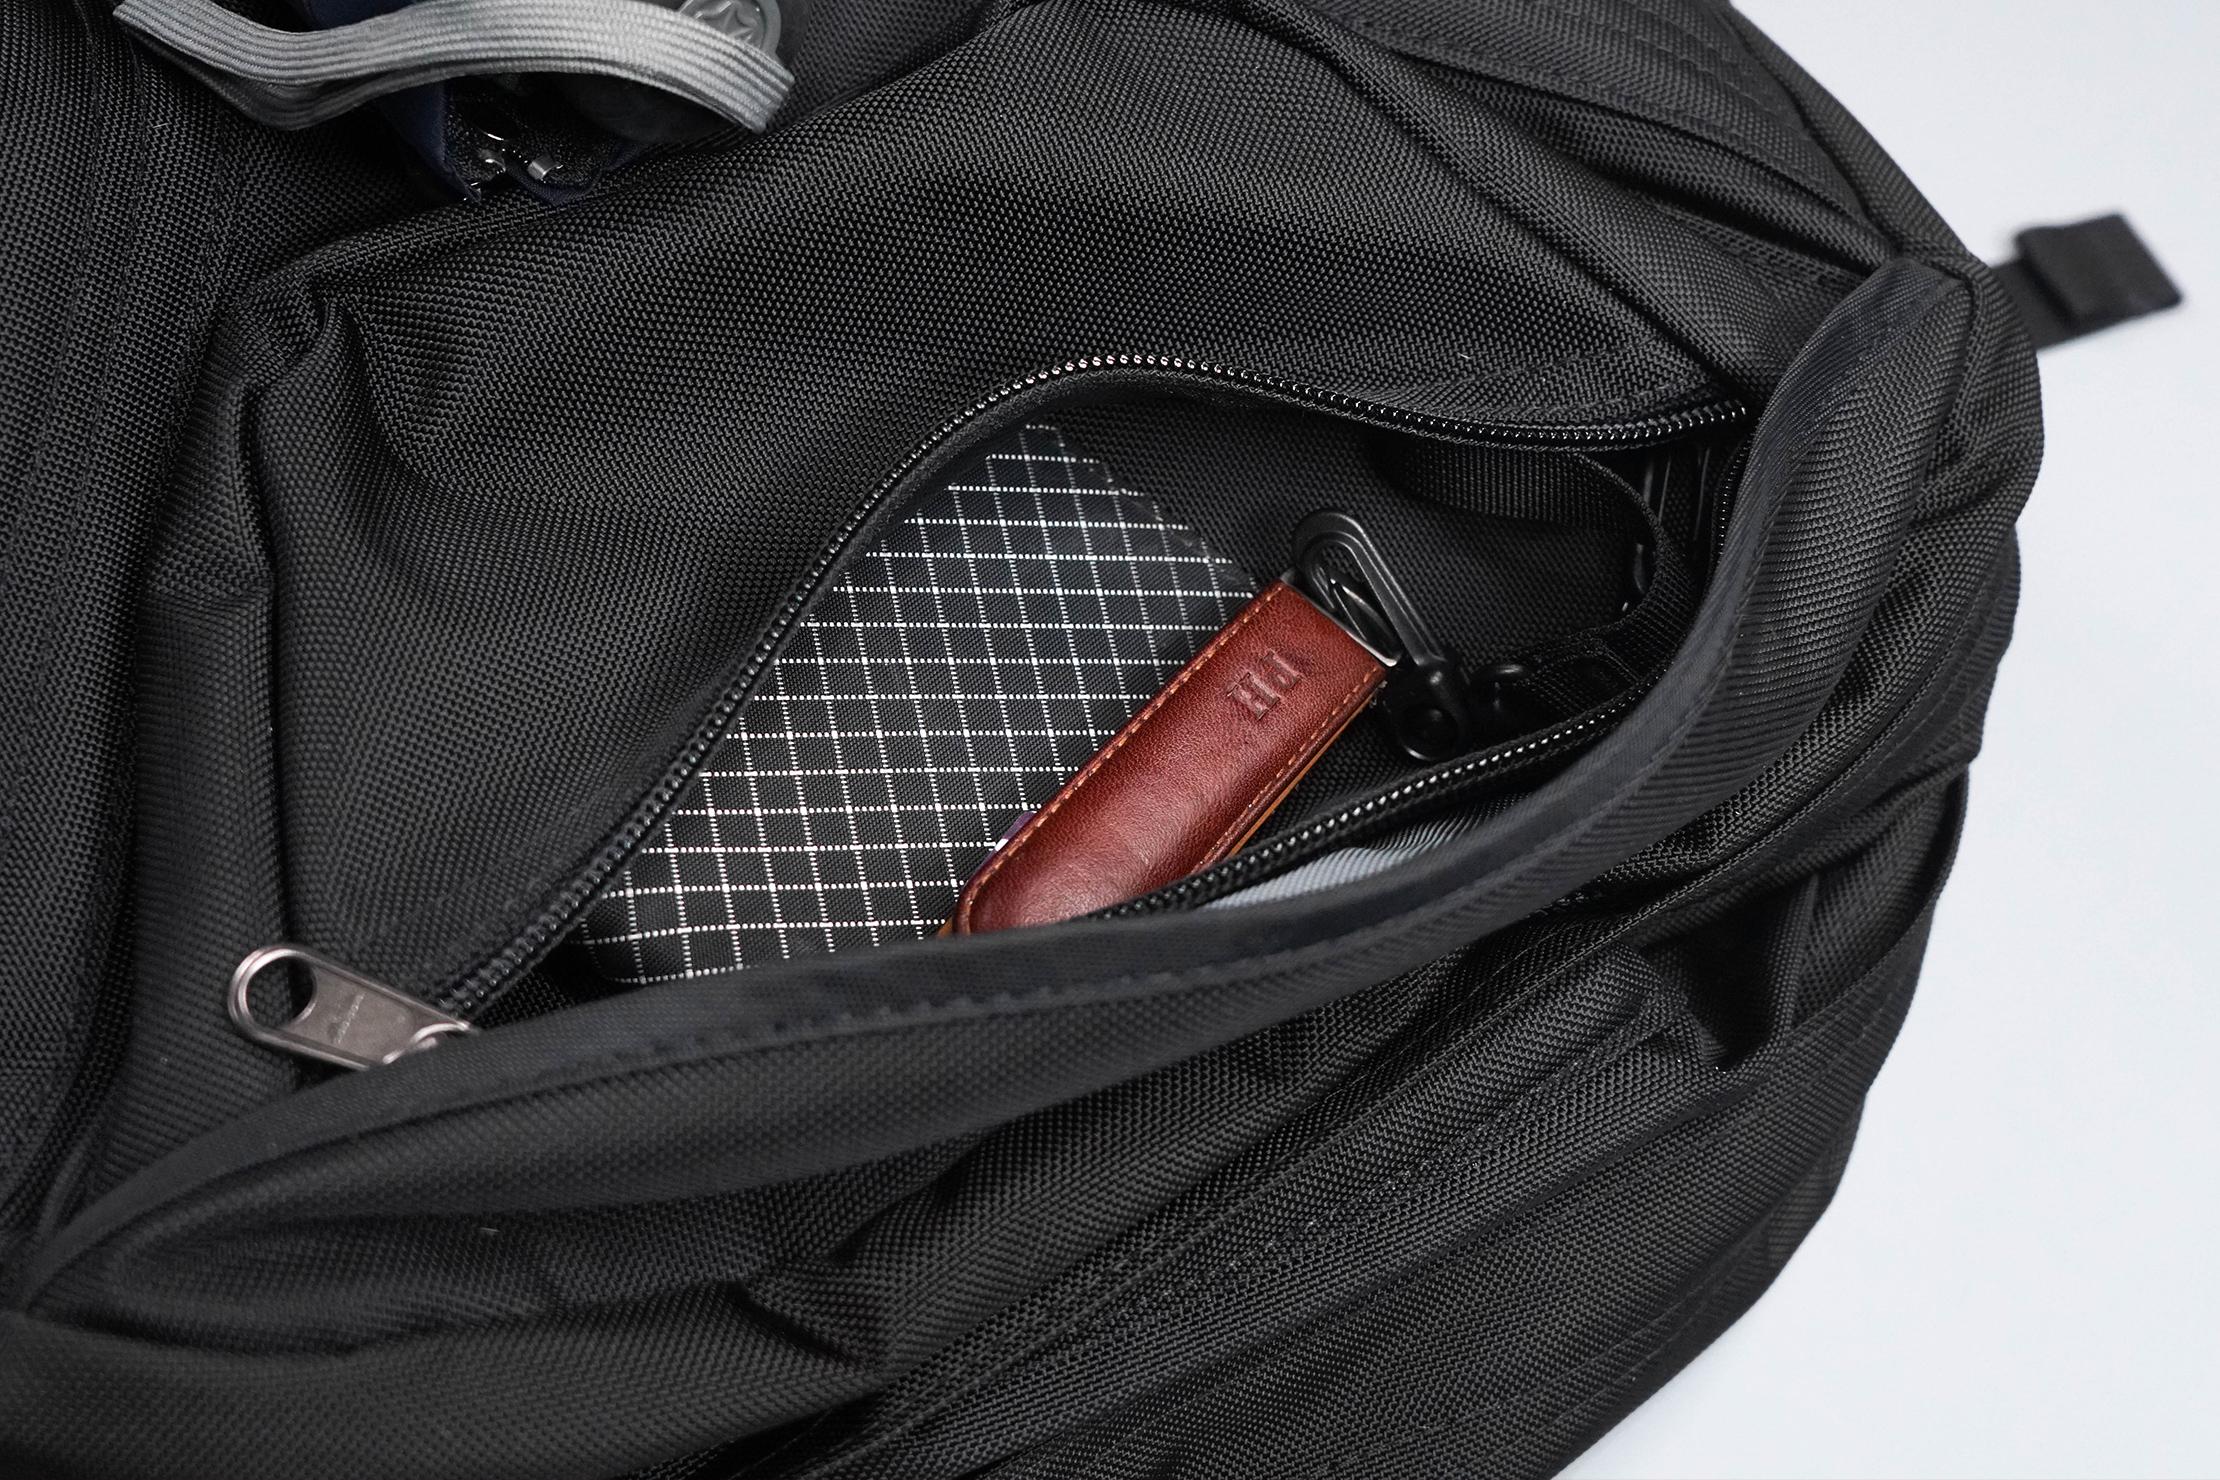 Tom Bihn Brain Bag Quick-Grab Pocket